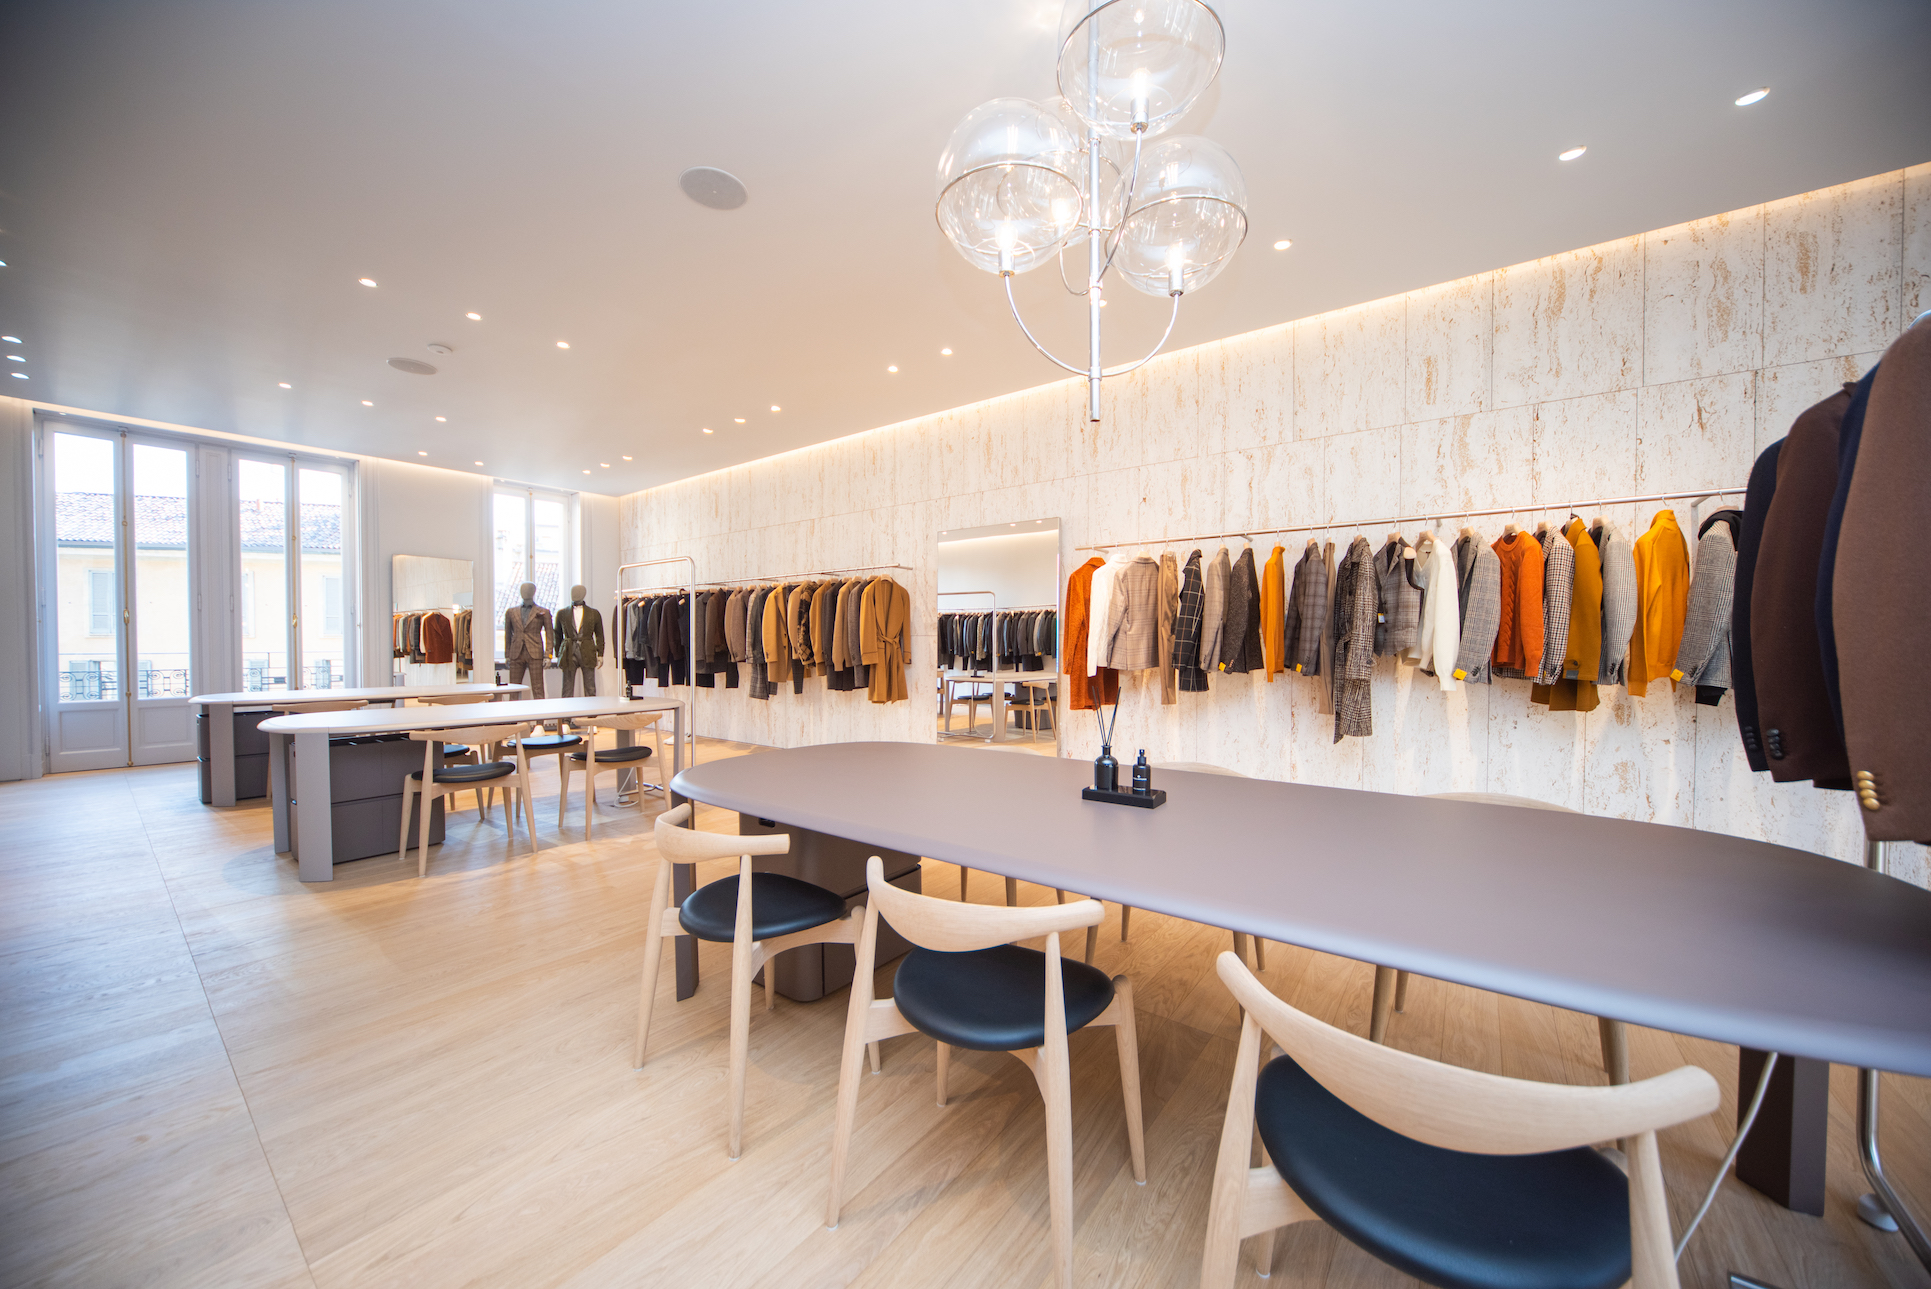 House of Tagliatore showroom Milano